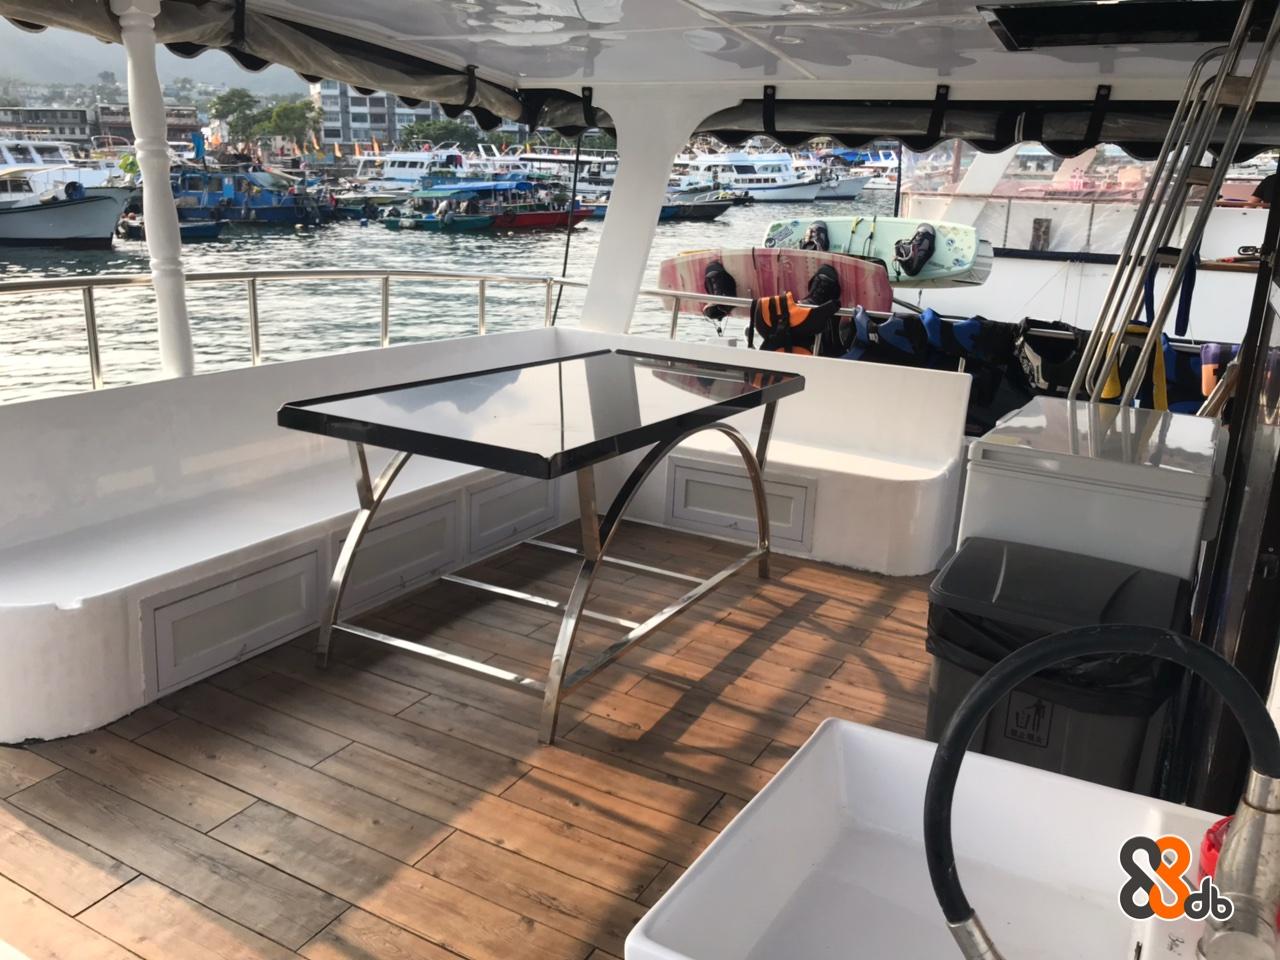 Yacht,Luxury yacht,Vehicle,Boat,Deck